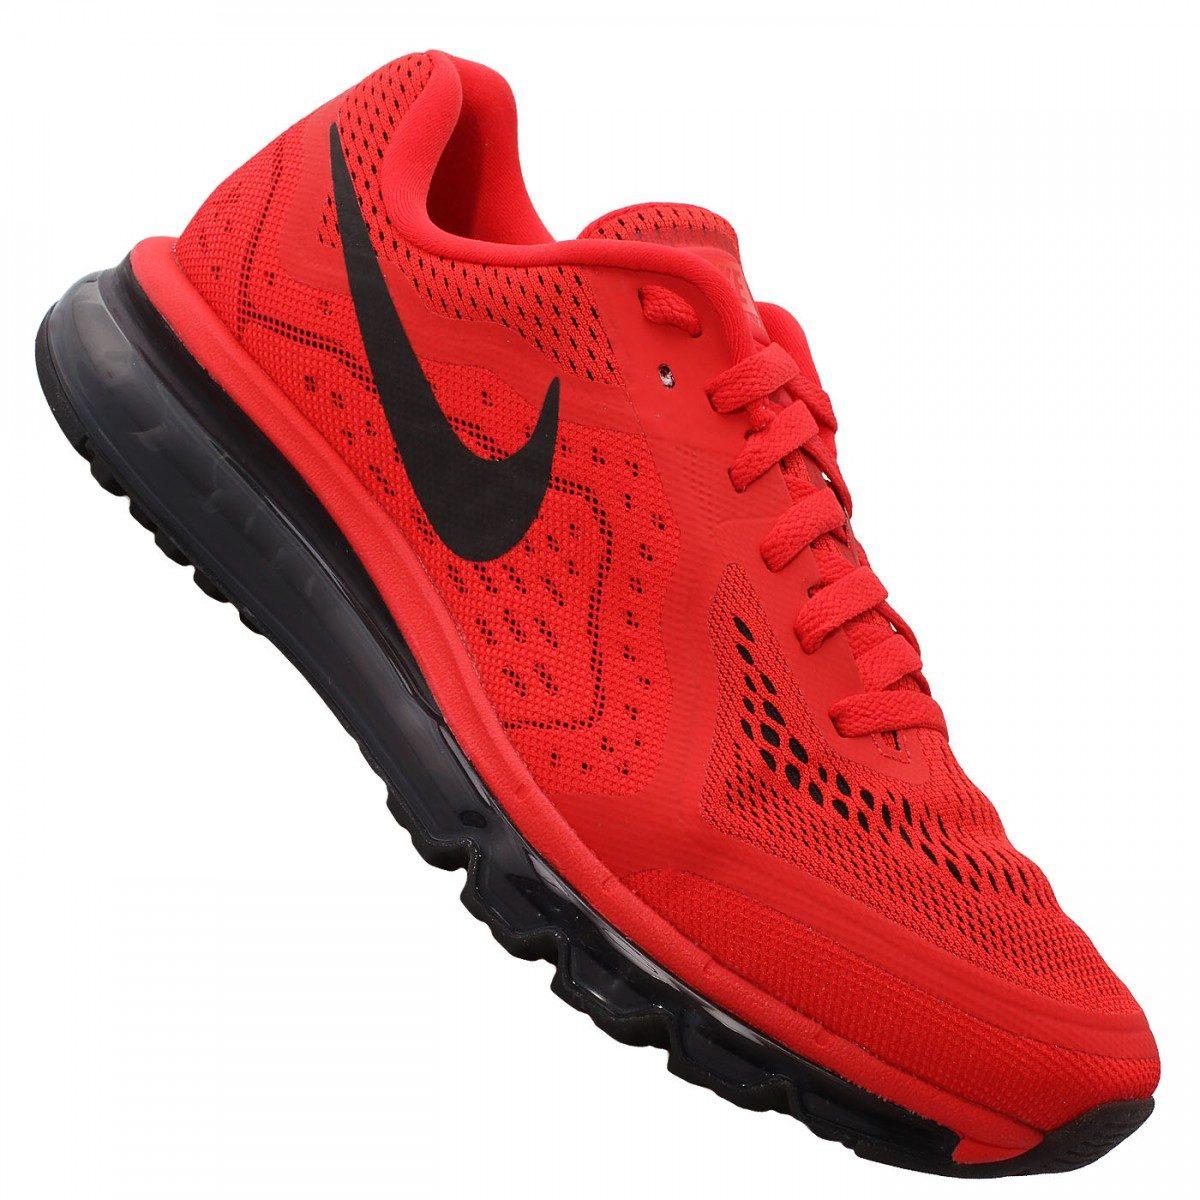 Chaussures Nike Air Max 2014 Marché Mobile Gratuit